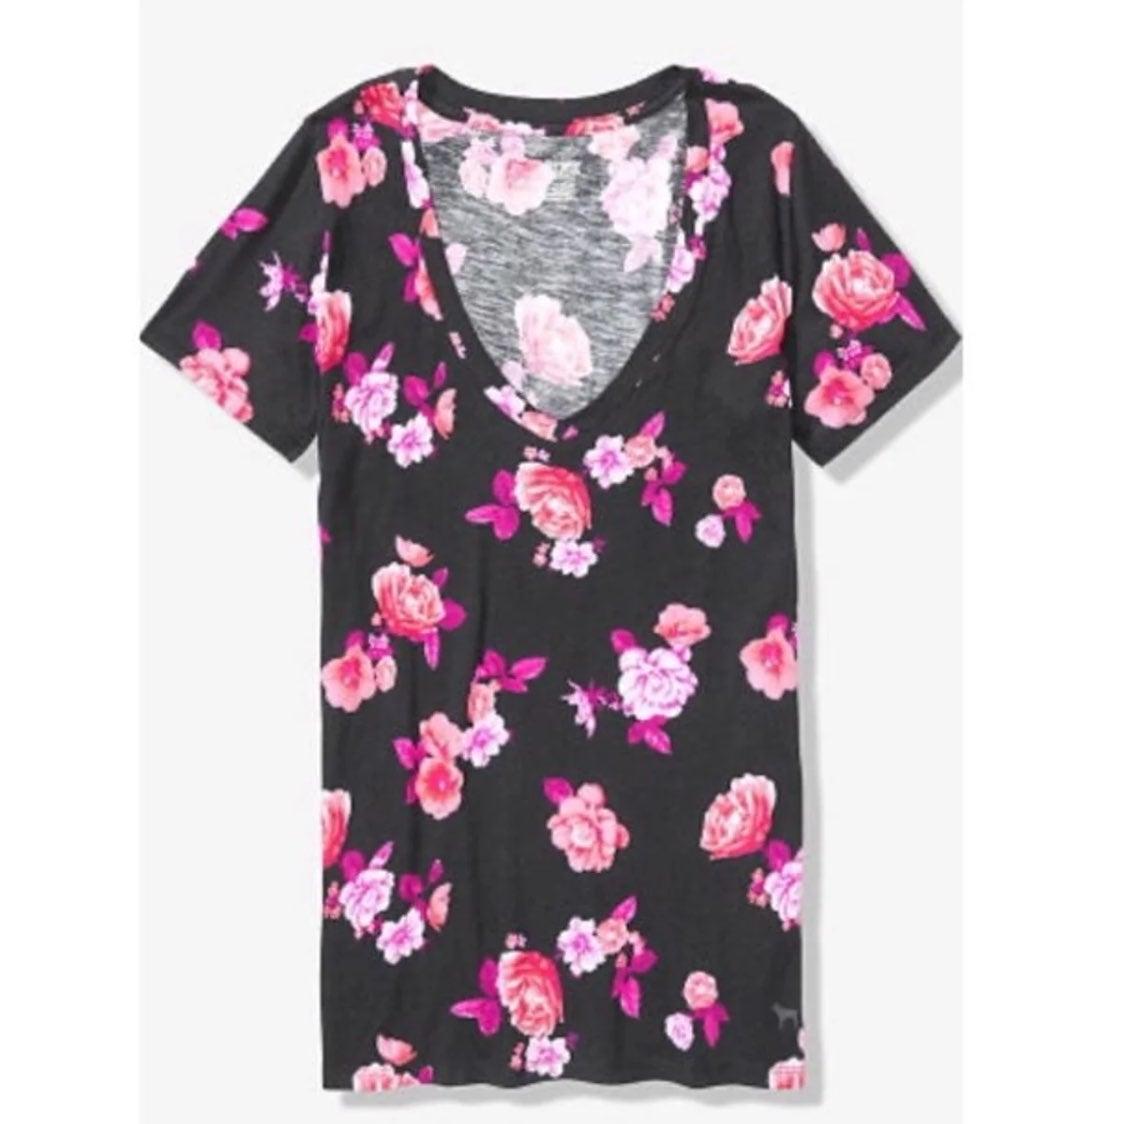 VS Pink floral v neck tee new tshirt L